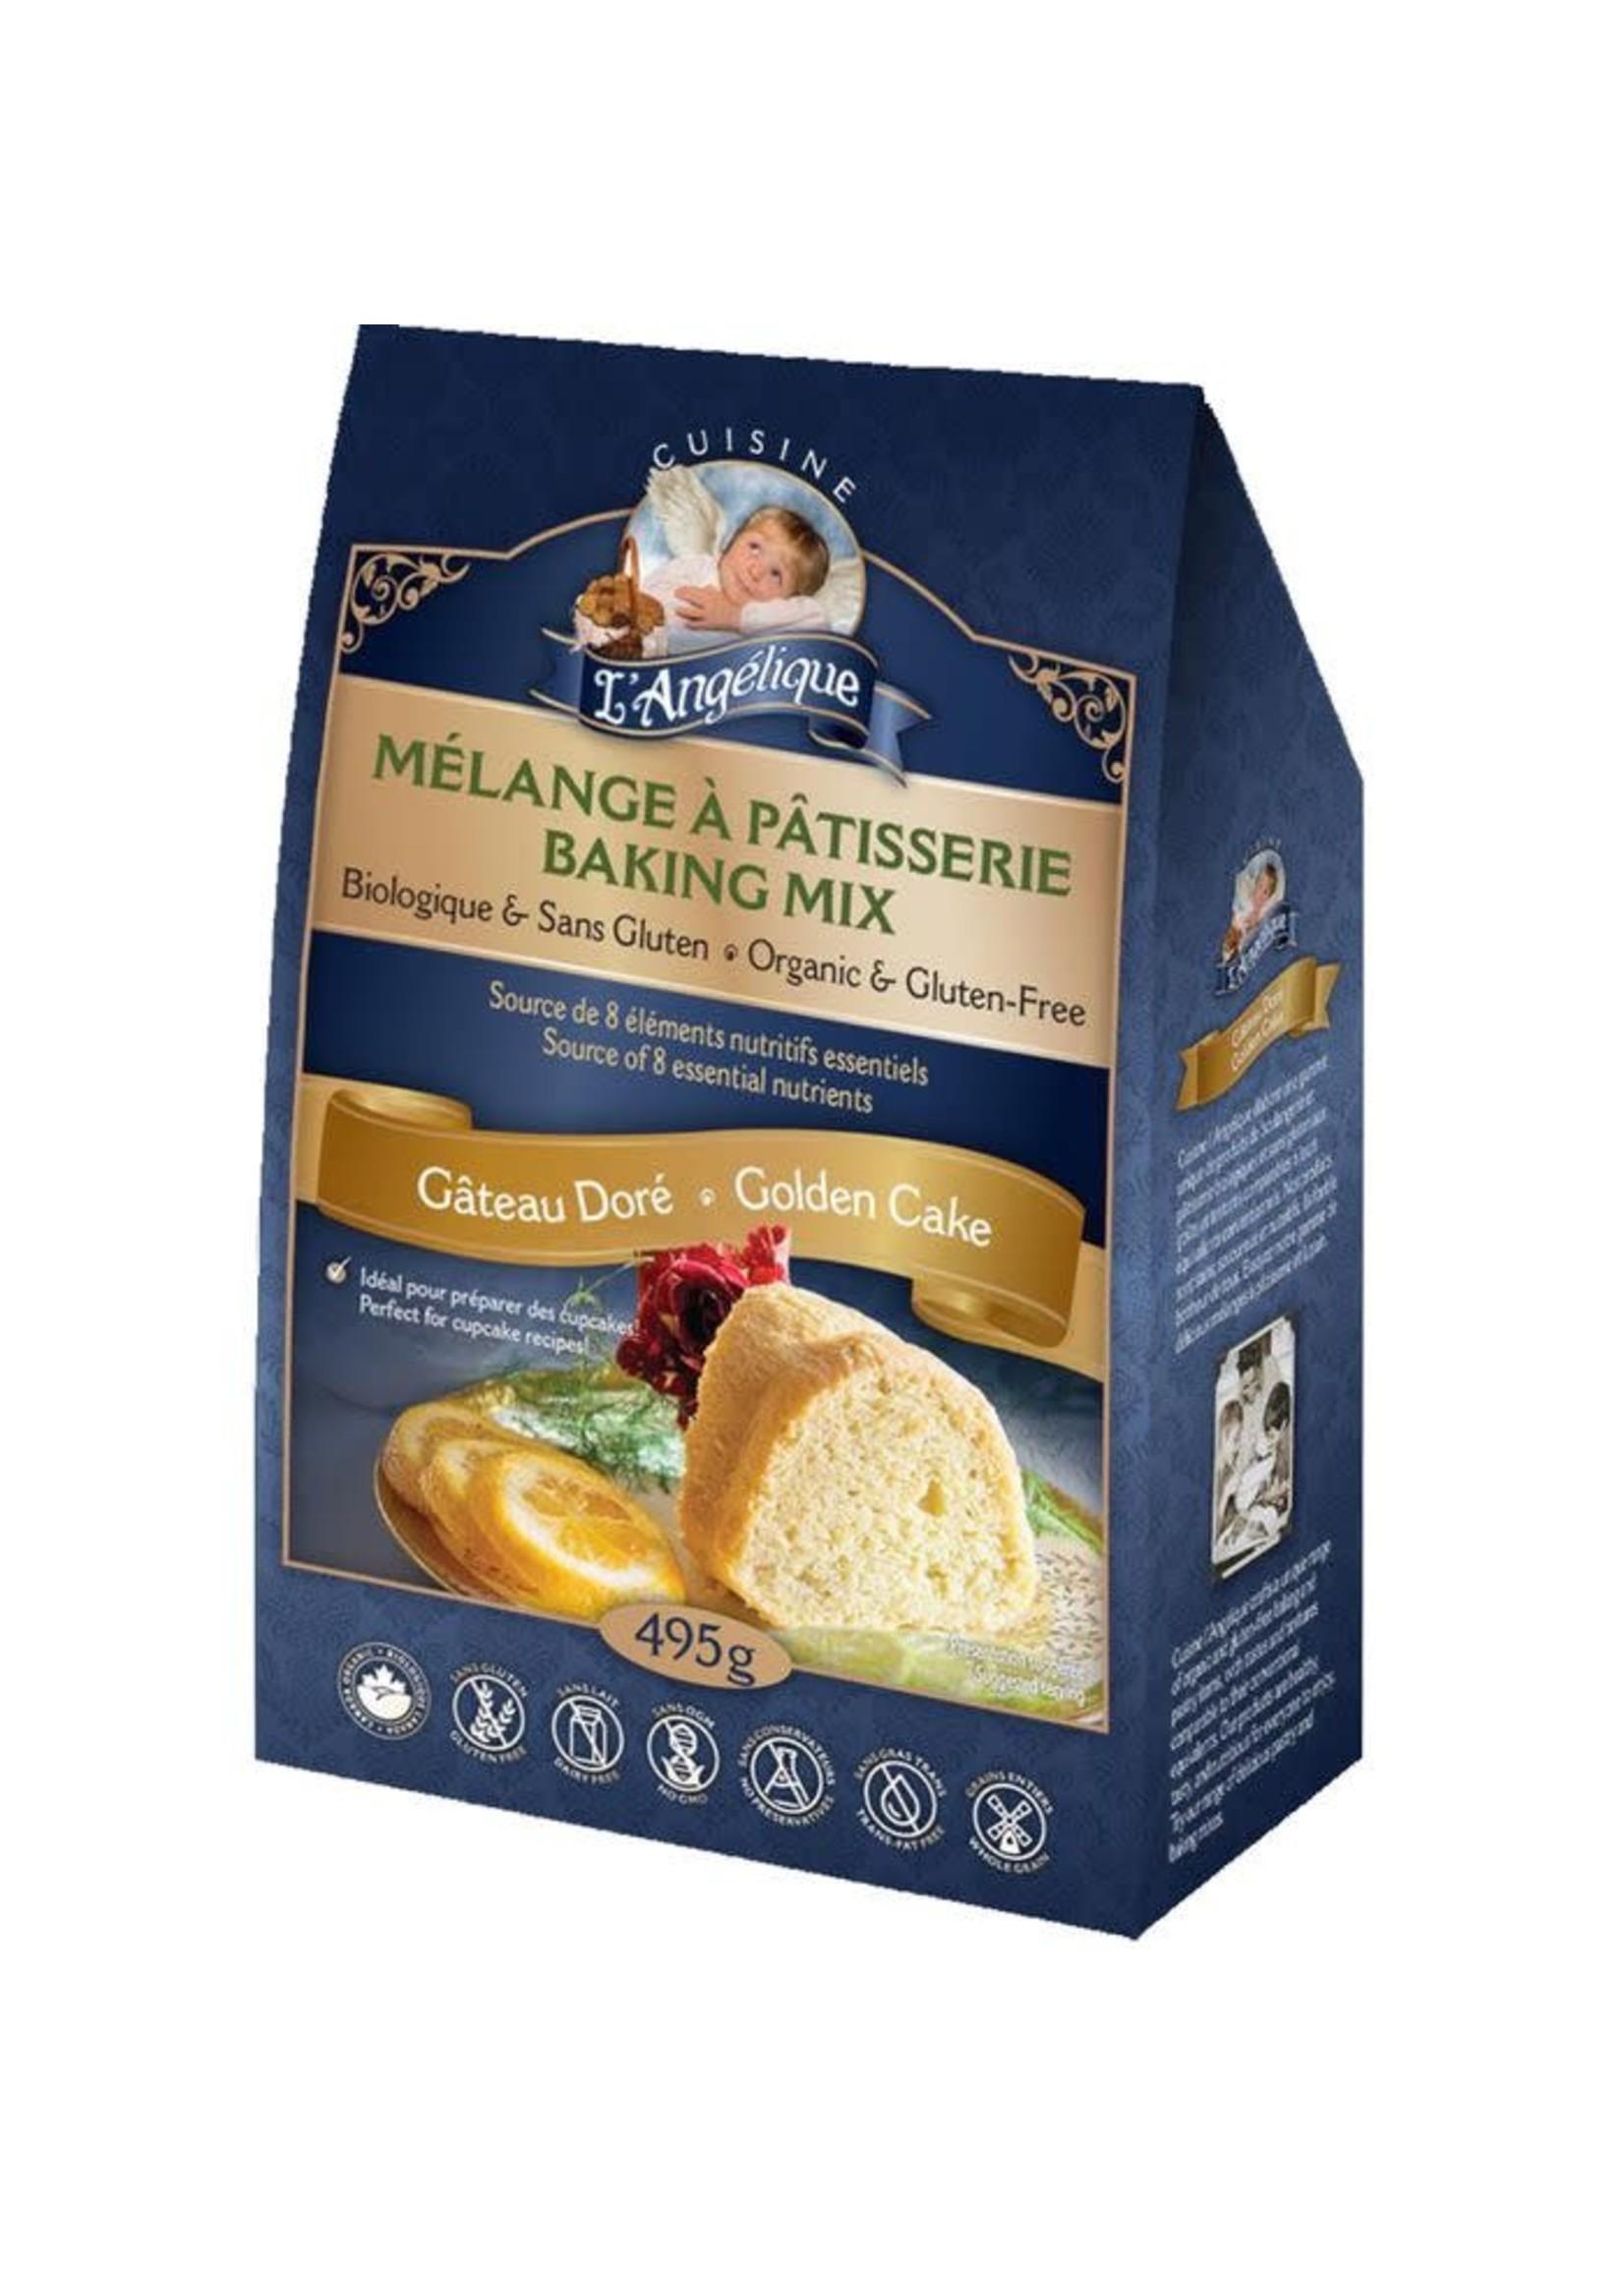 Cuisine L'Angelique Cuisine L'Angelique Gluten-Free & Organic- Golden Cake Mix